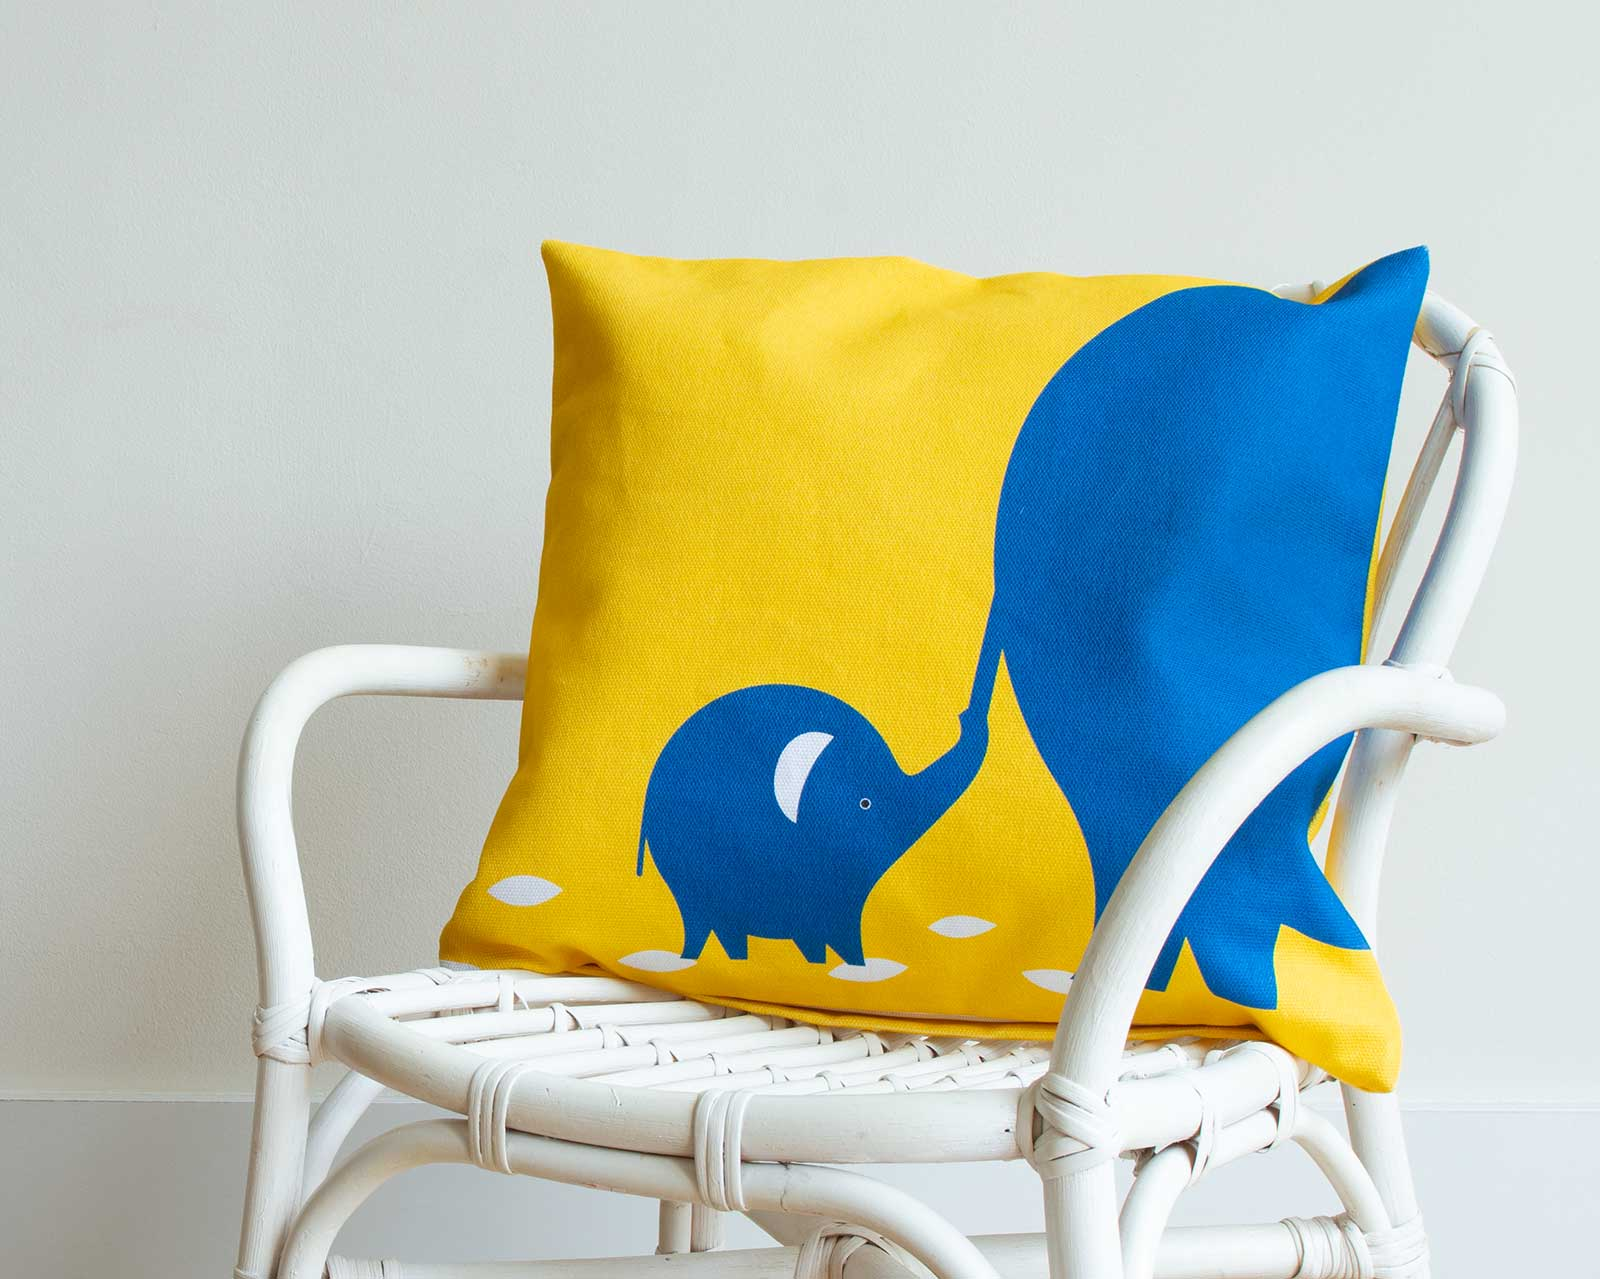 Never let go Kussenhoes kinderkamer blauw geel Olifant Pie 40x40 cm stoel